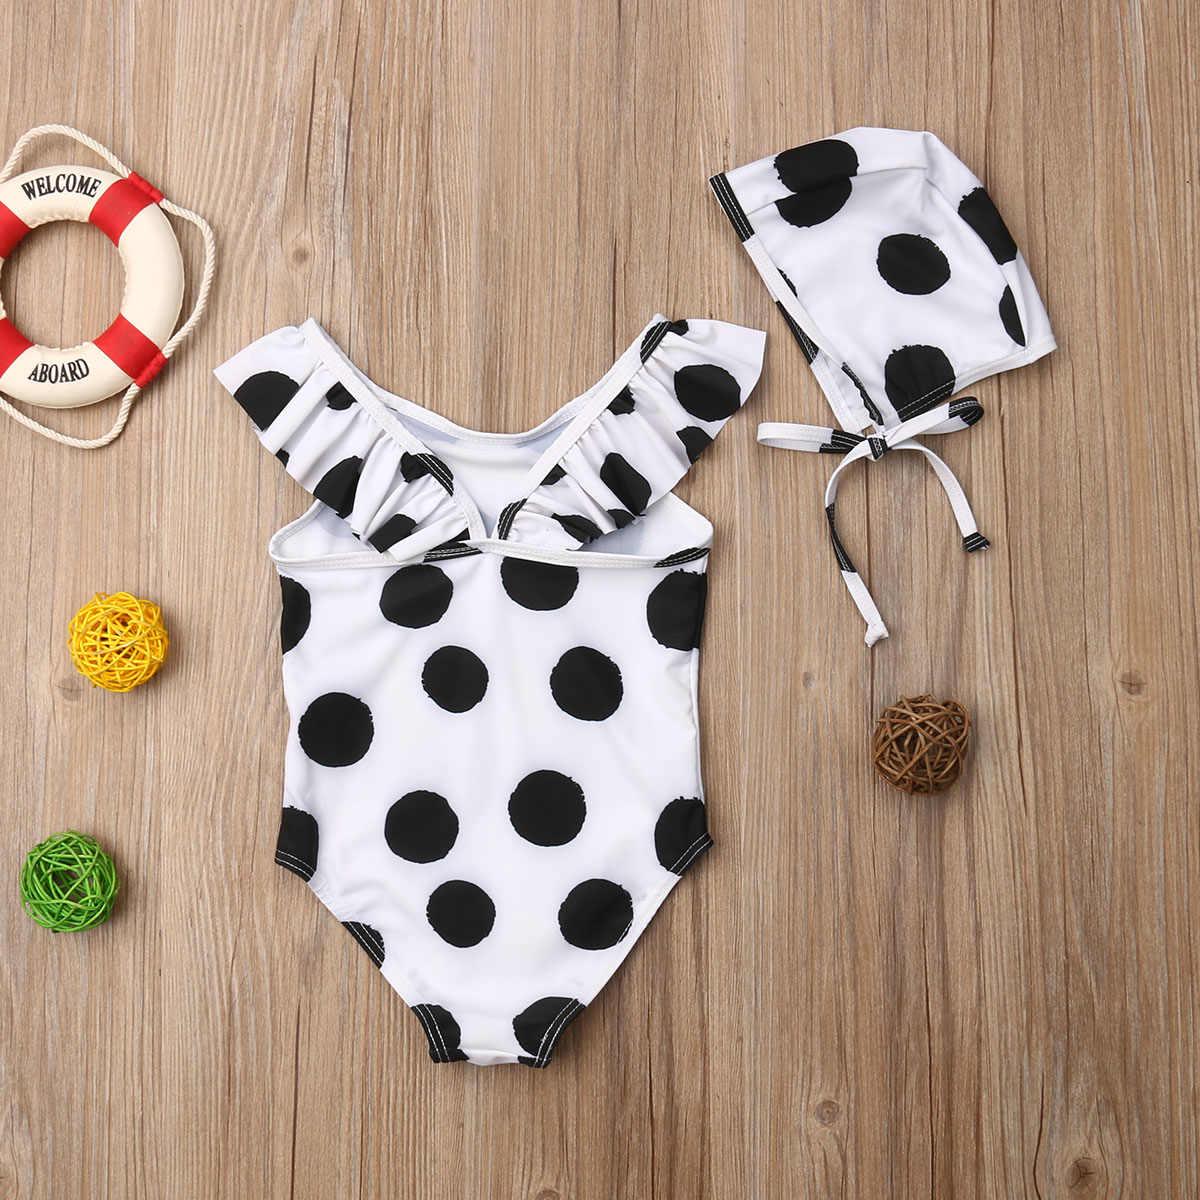 1-6T Bayi Baru Lahir Anak Bayi Anak Perempuan Polka Dot Bikini Baju Renang Swimsuit Beach + Topi